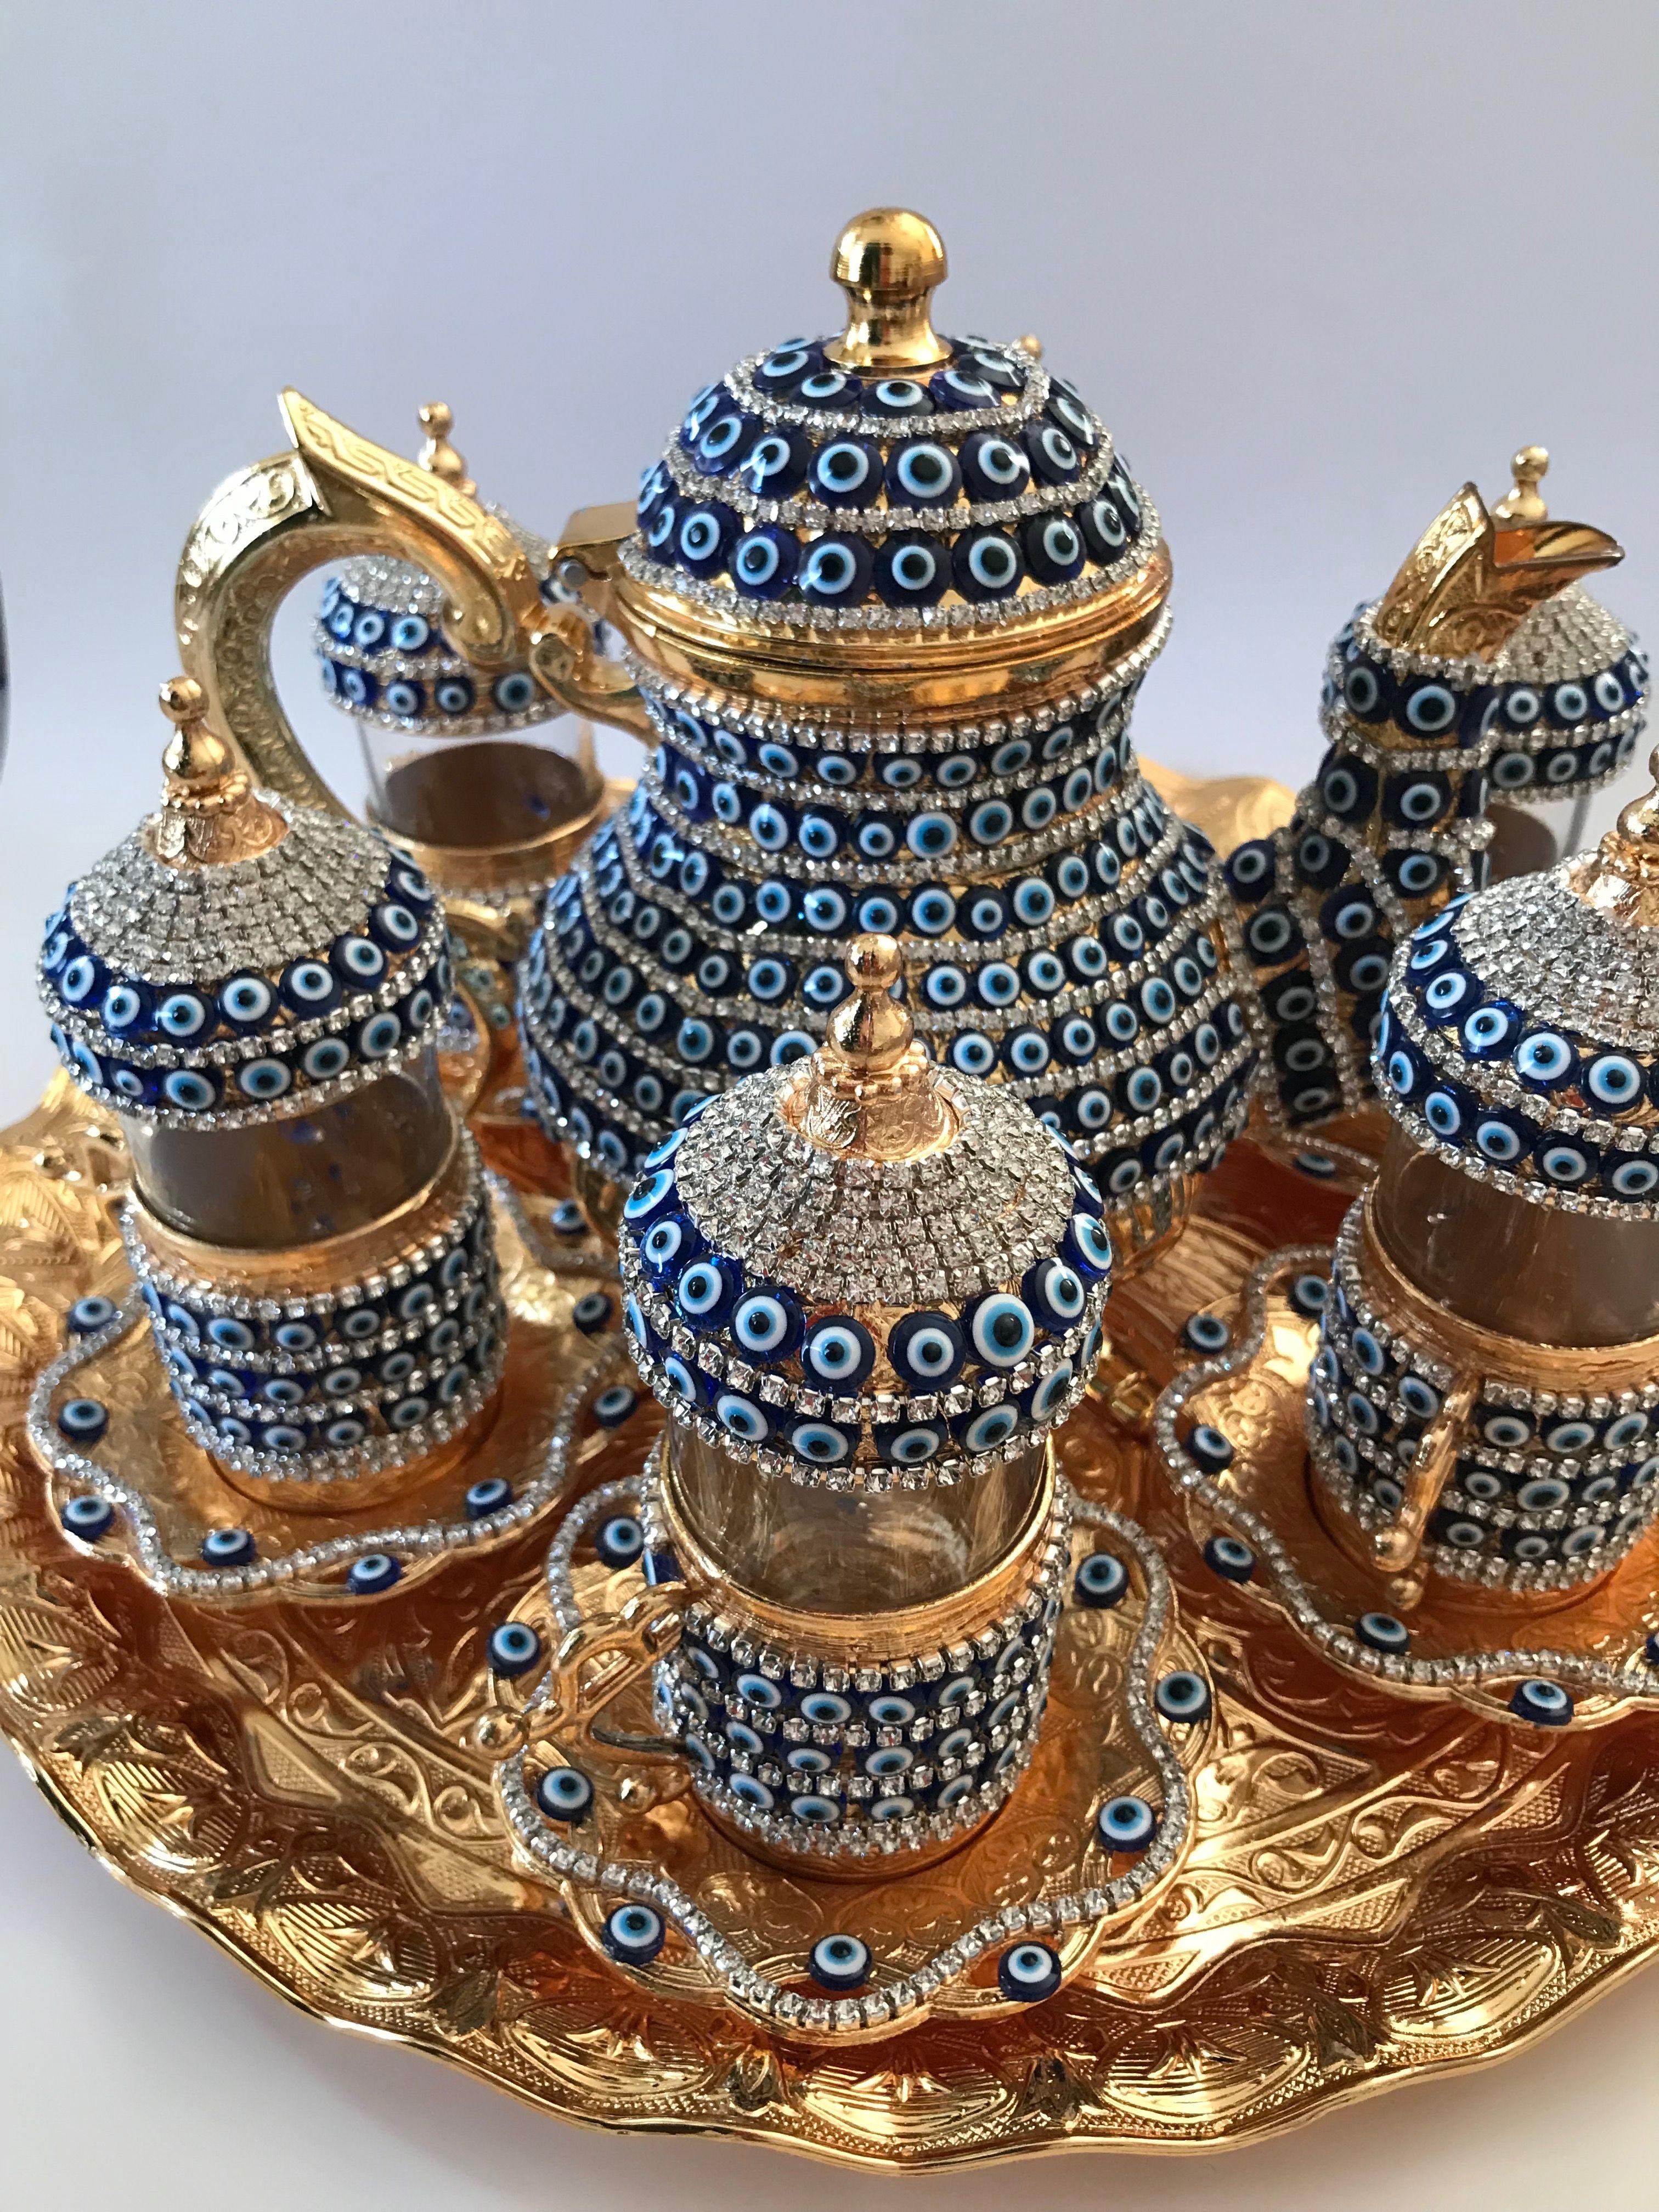 Details about 28 pc turkish arabic glass tea cup saucer